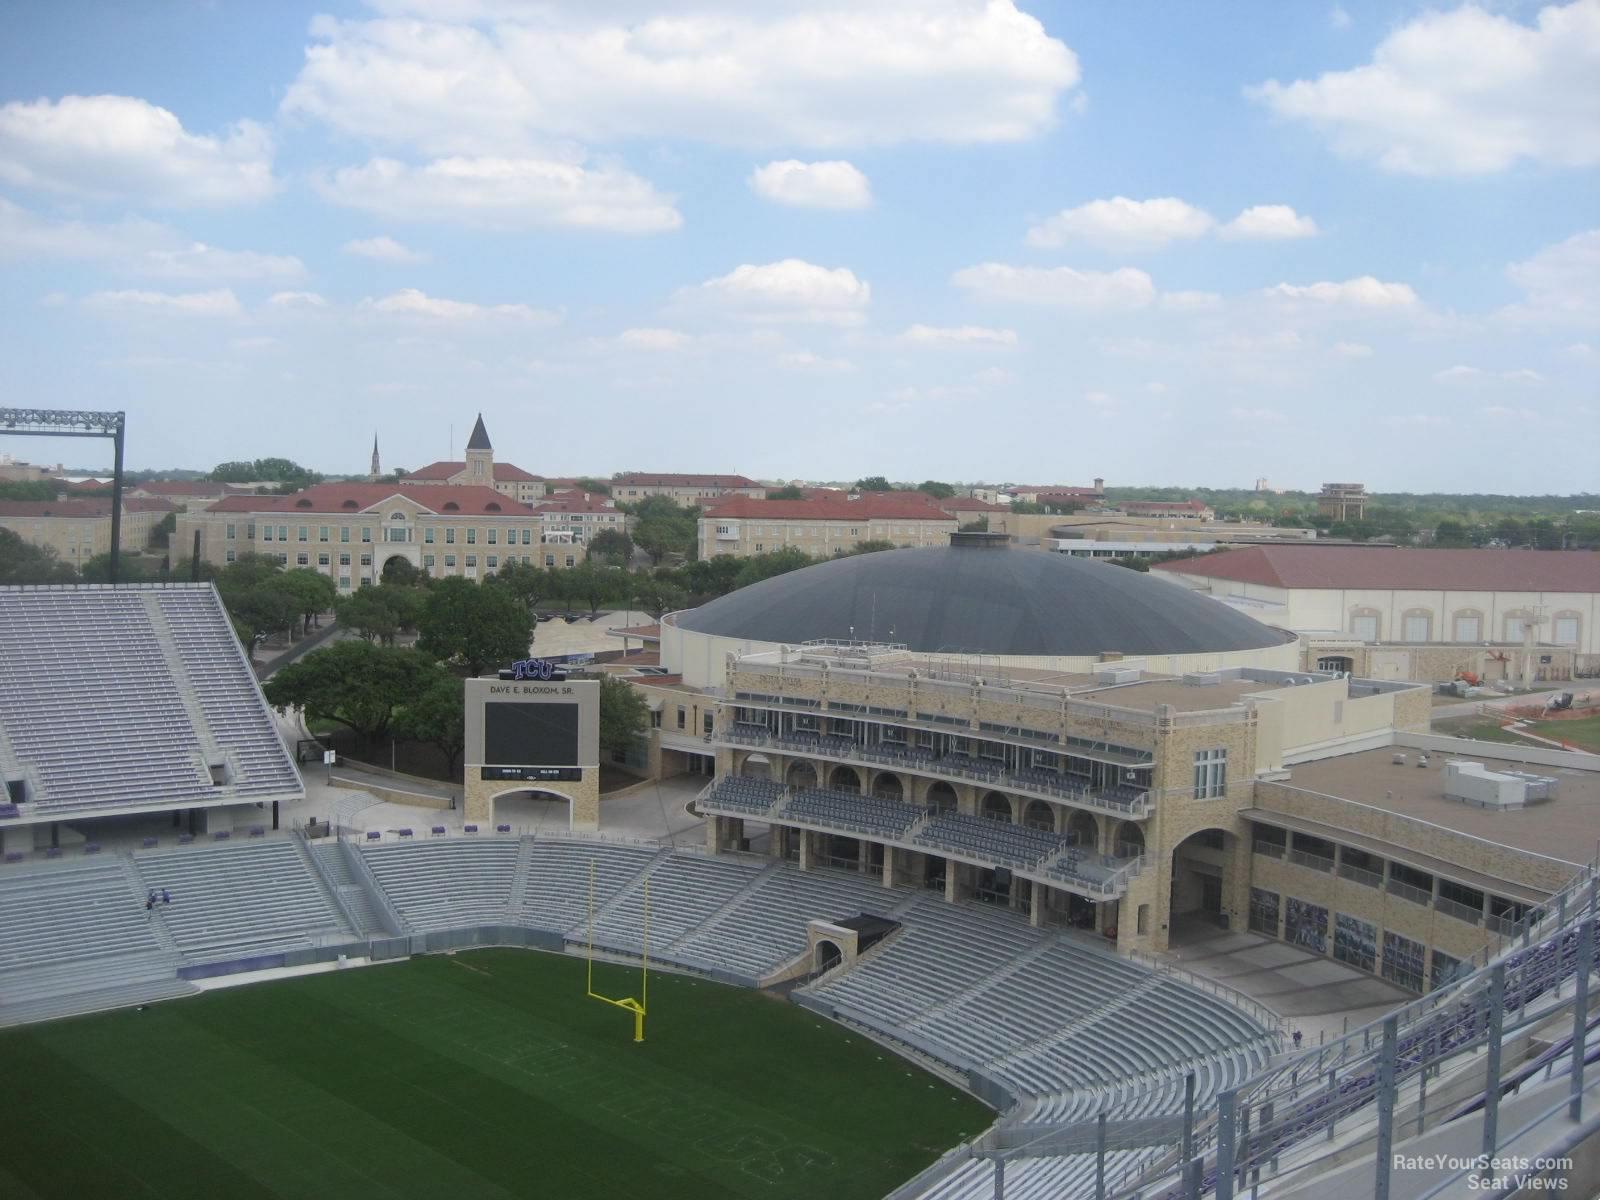 Views of the TCU Campus